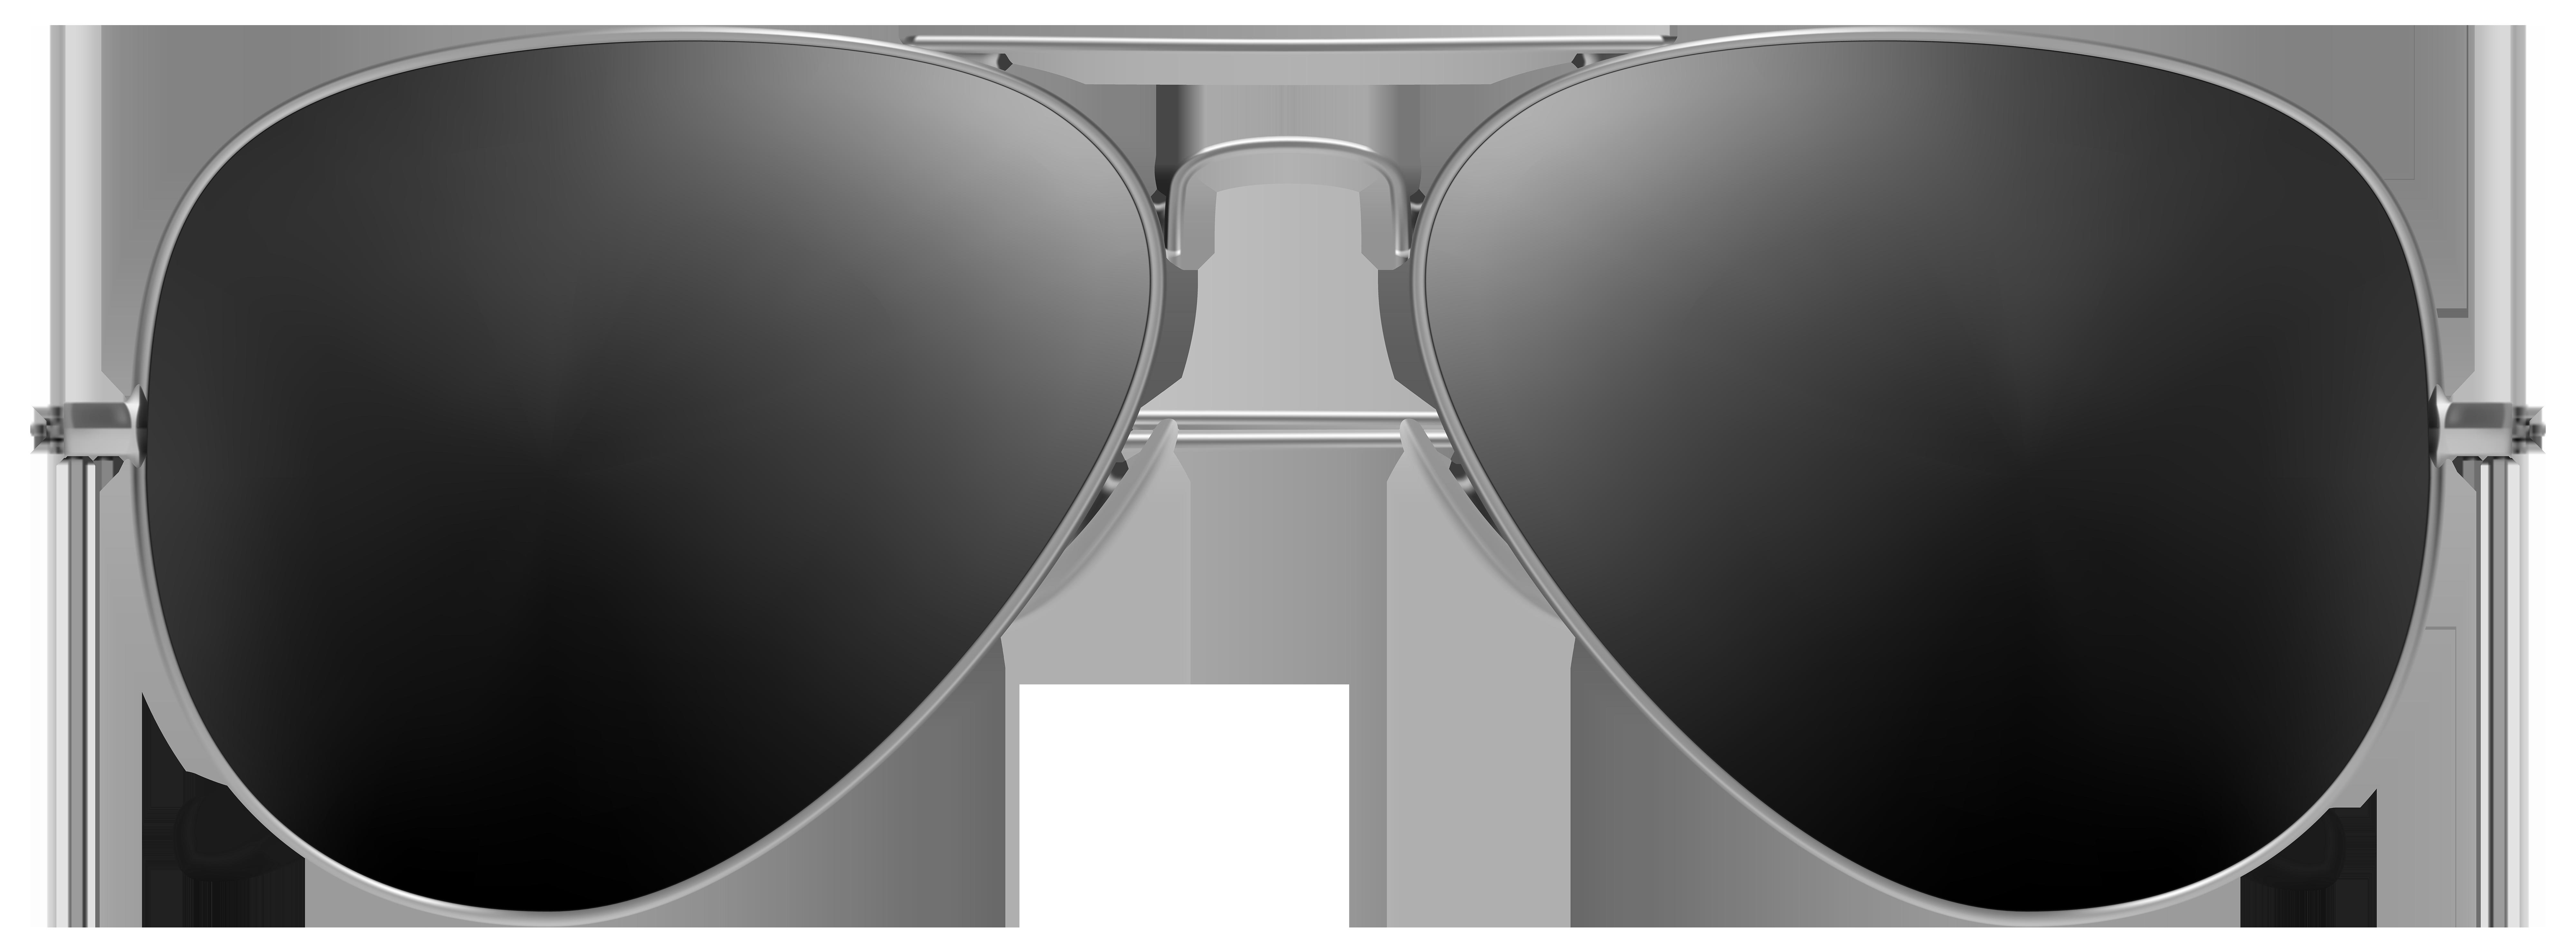 Aviator Sunglasses PNG Clip Art Image.